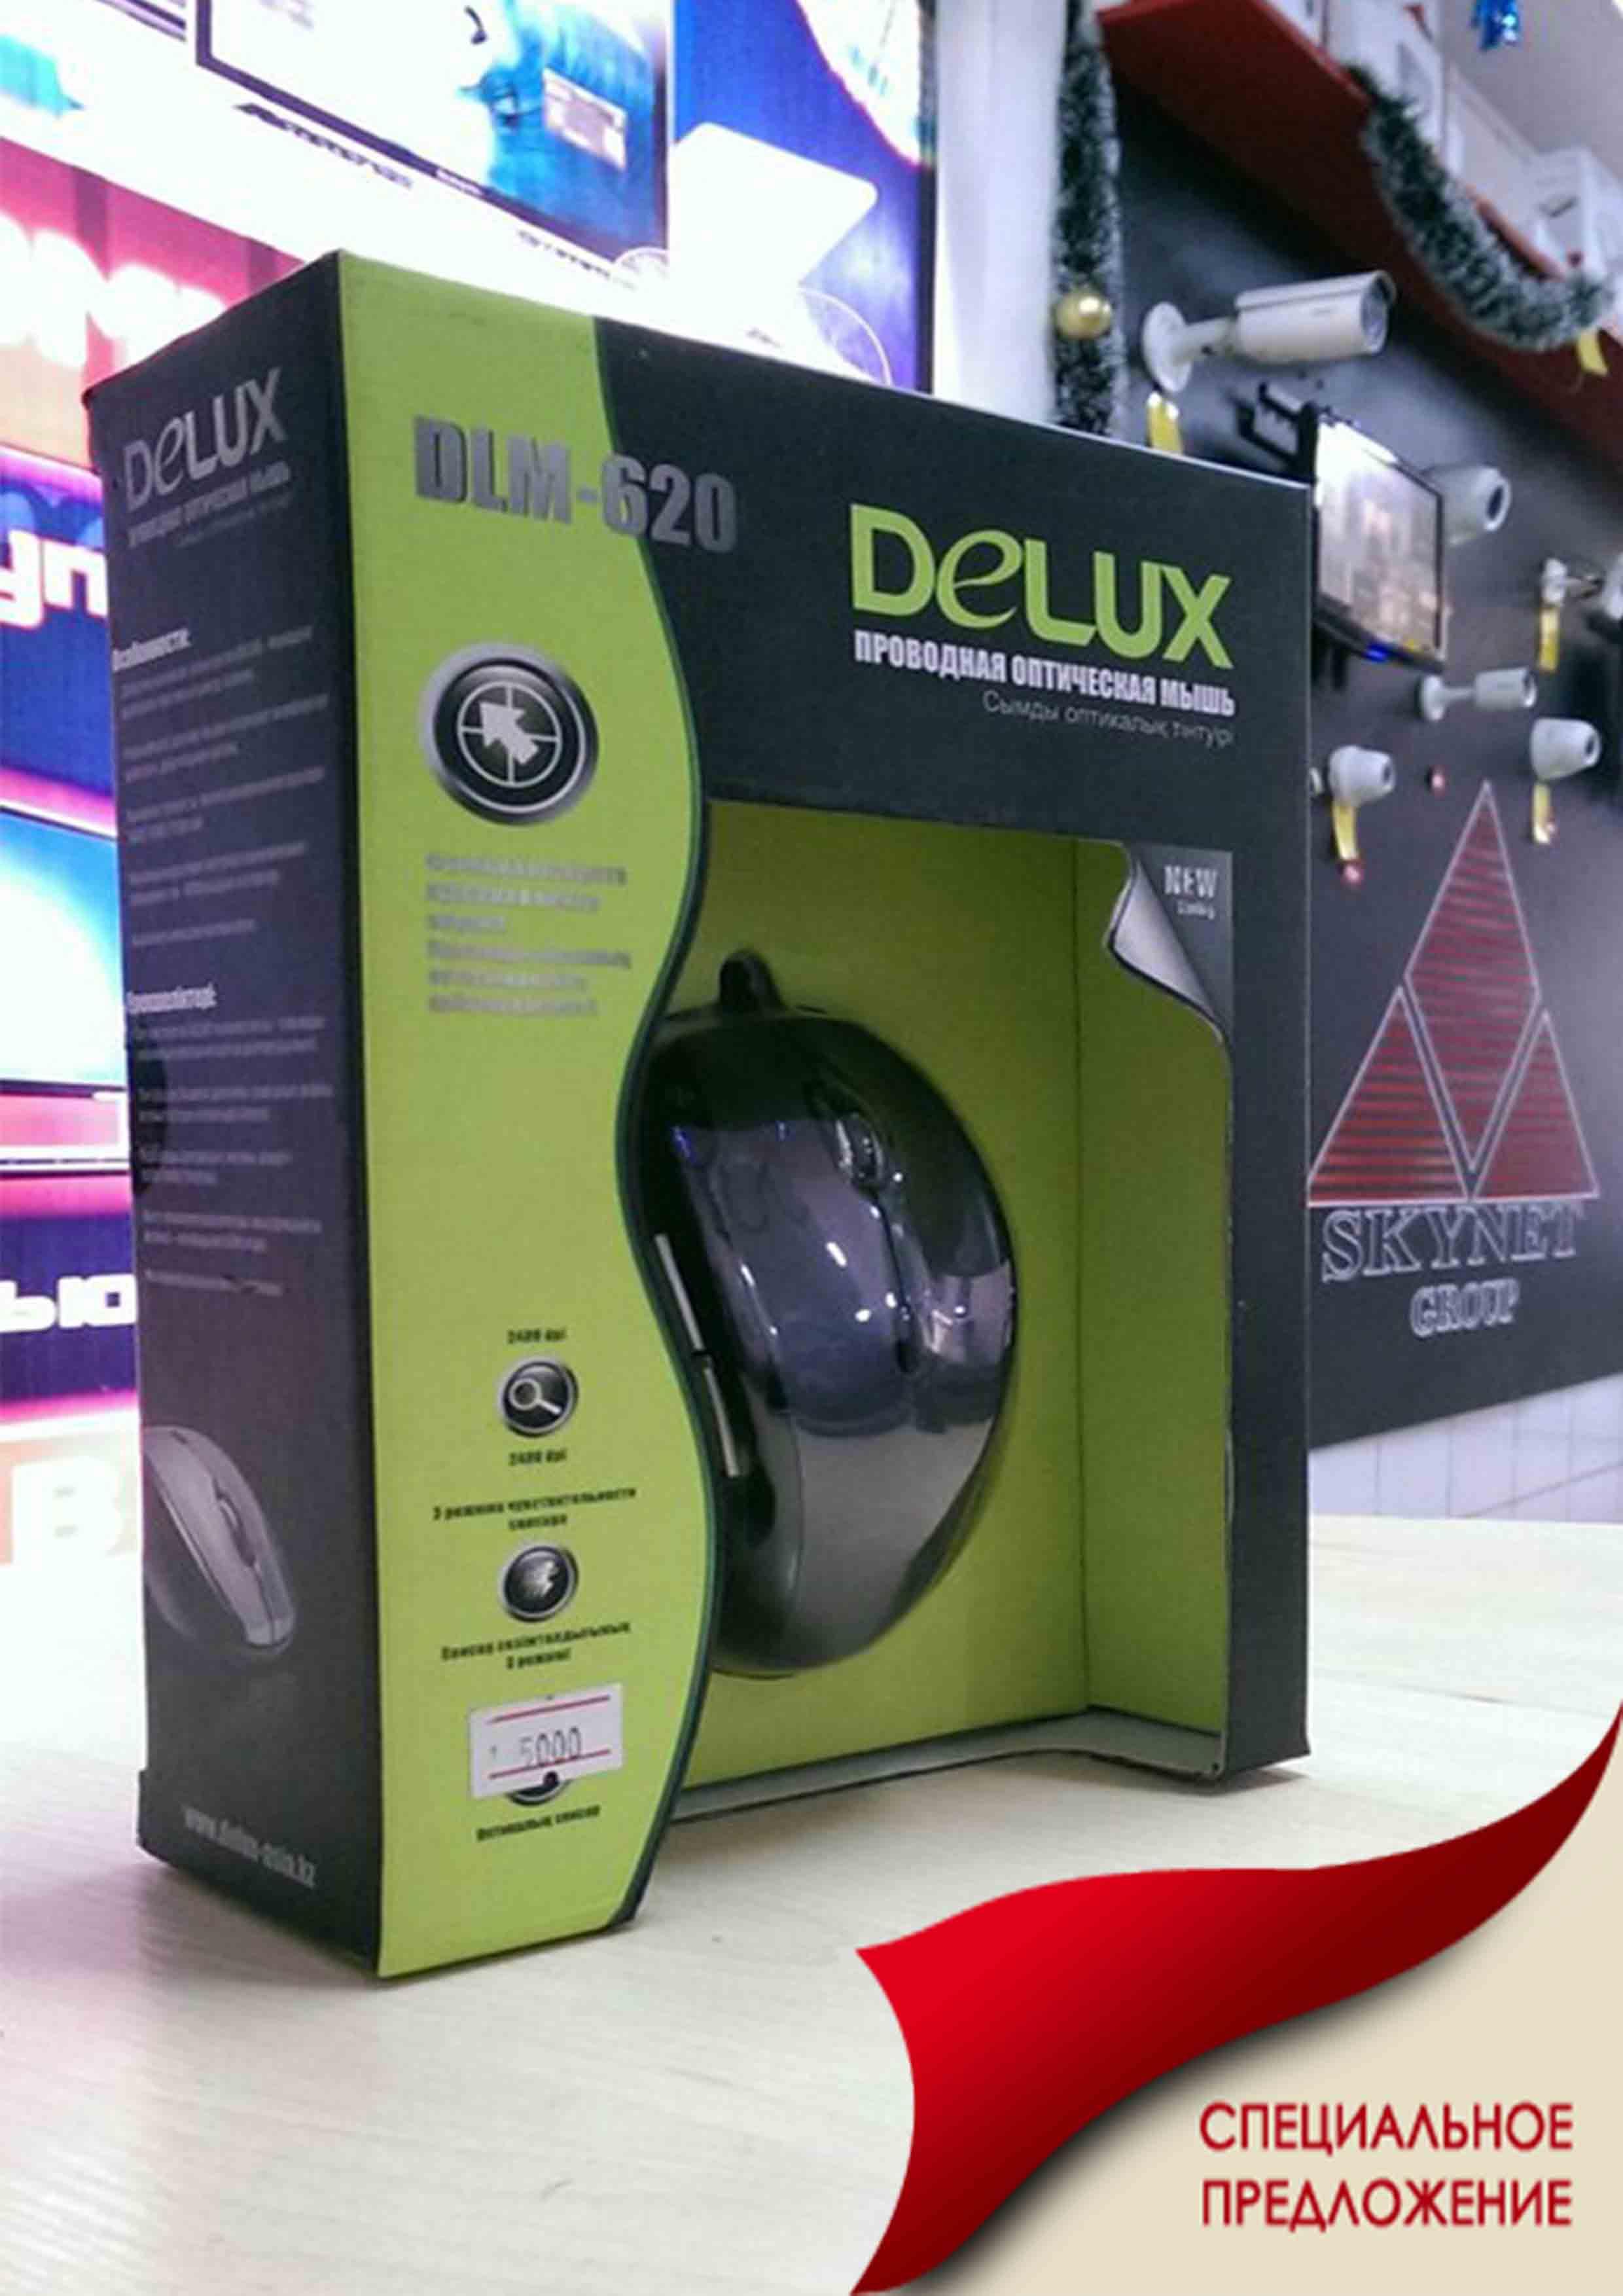 Мышка проводная Delux DLM-620